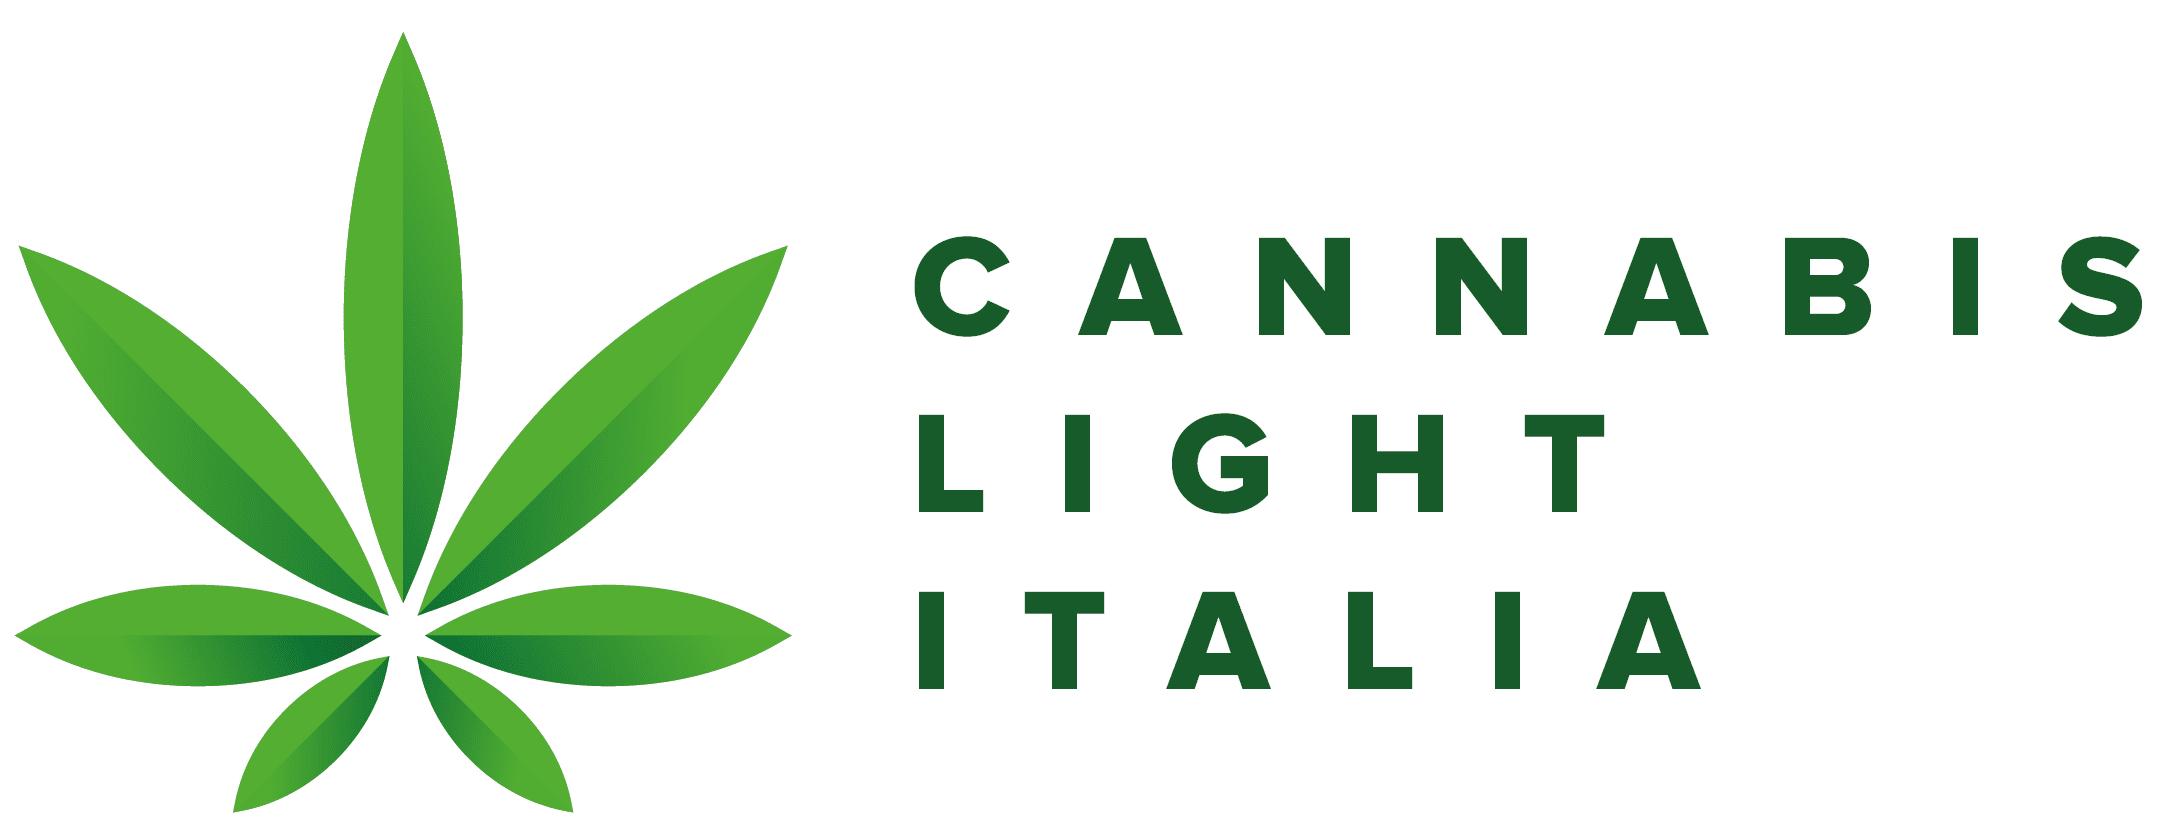 Cannabis light Italia - Canapa e CBD online